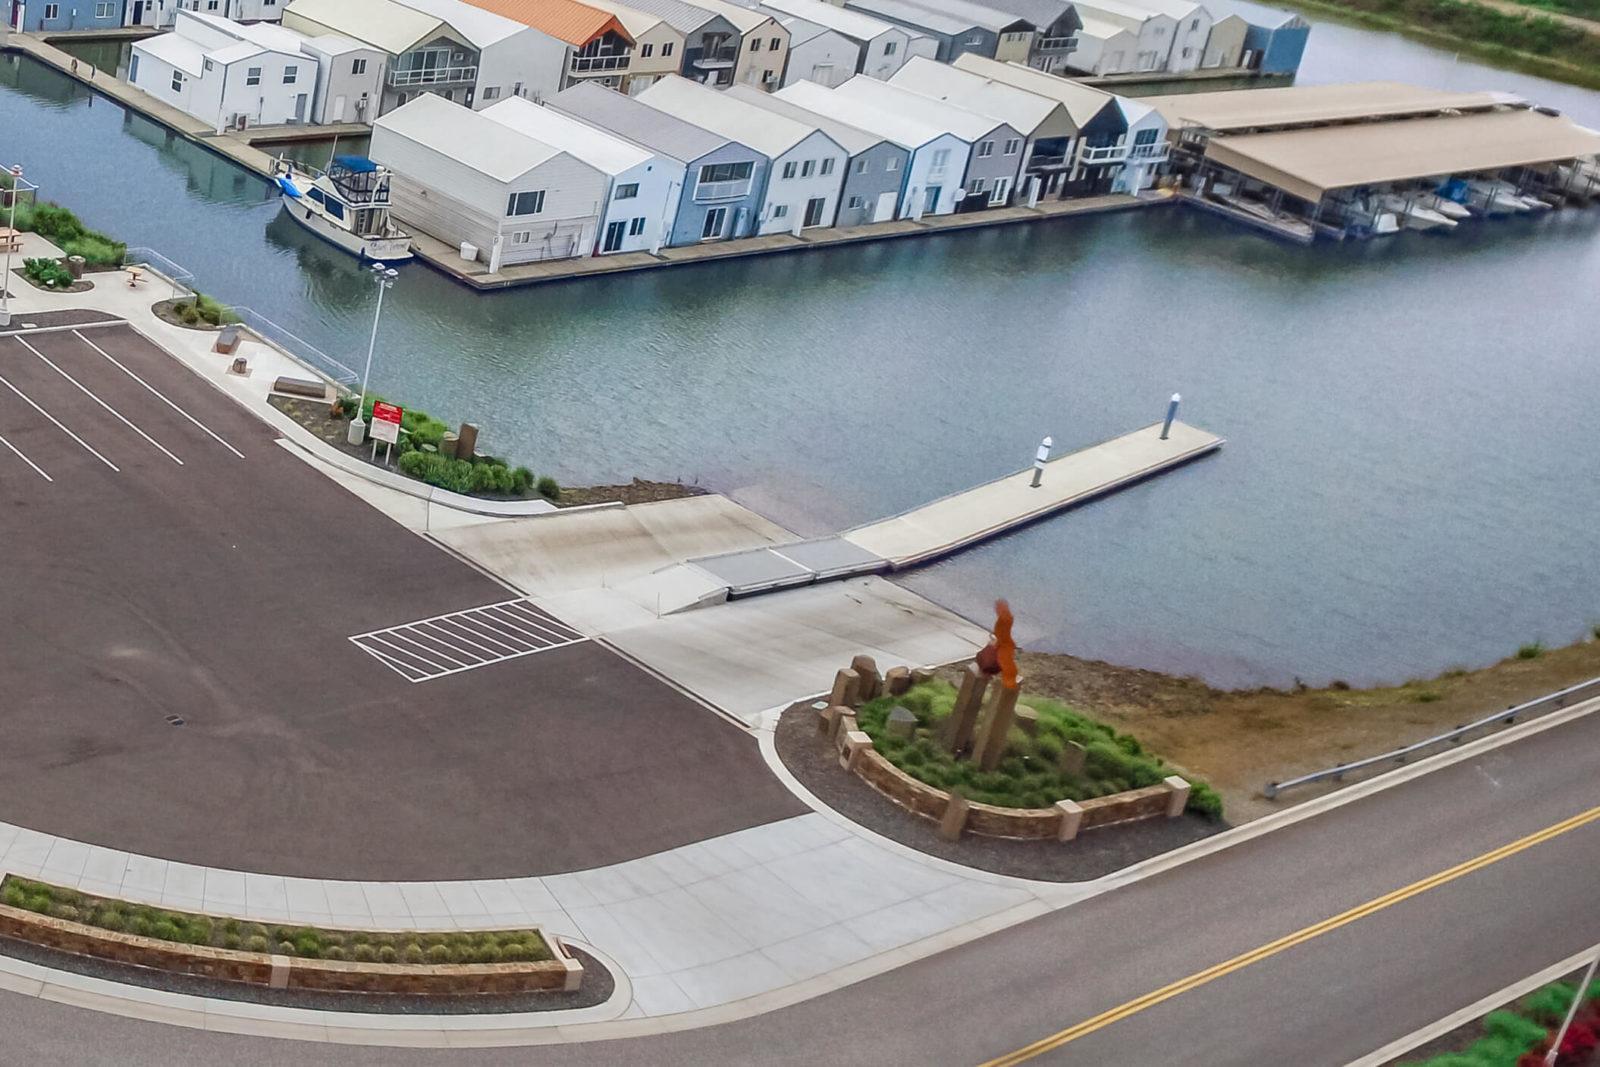 Clover Island Marina public boat launch.